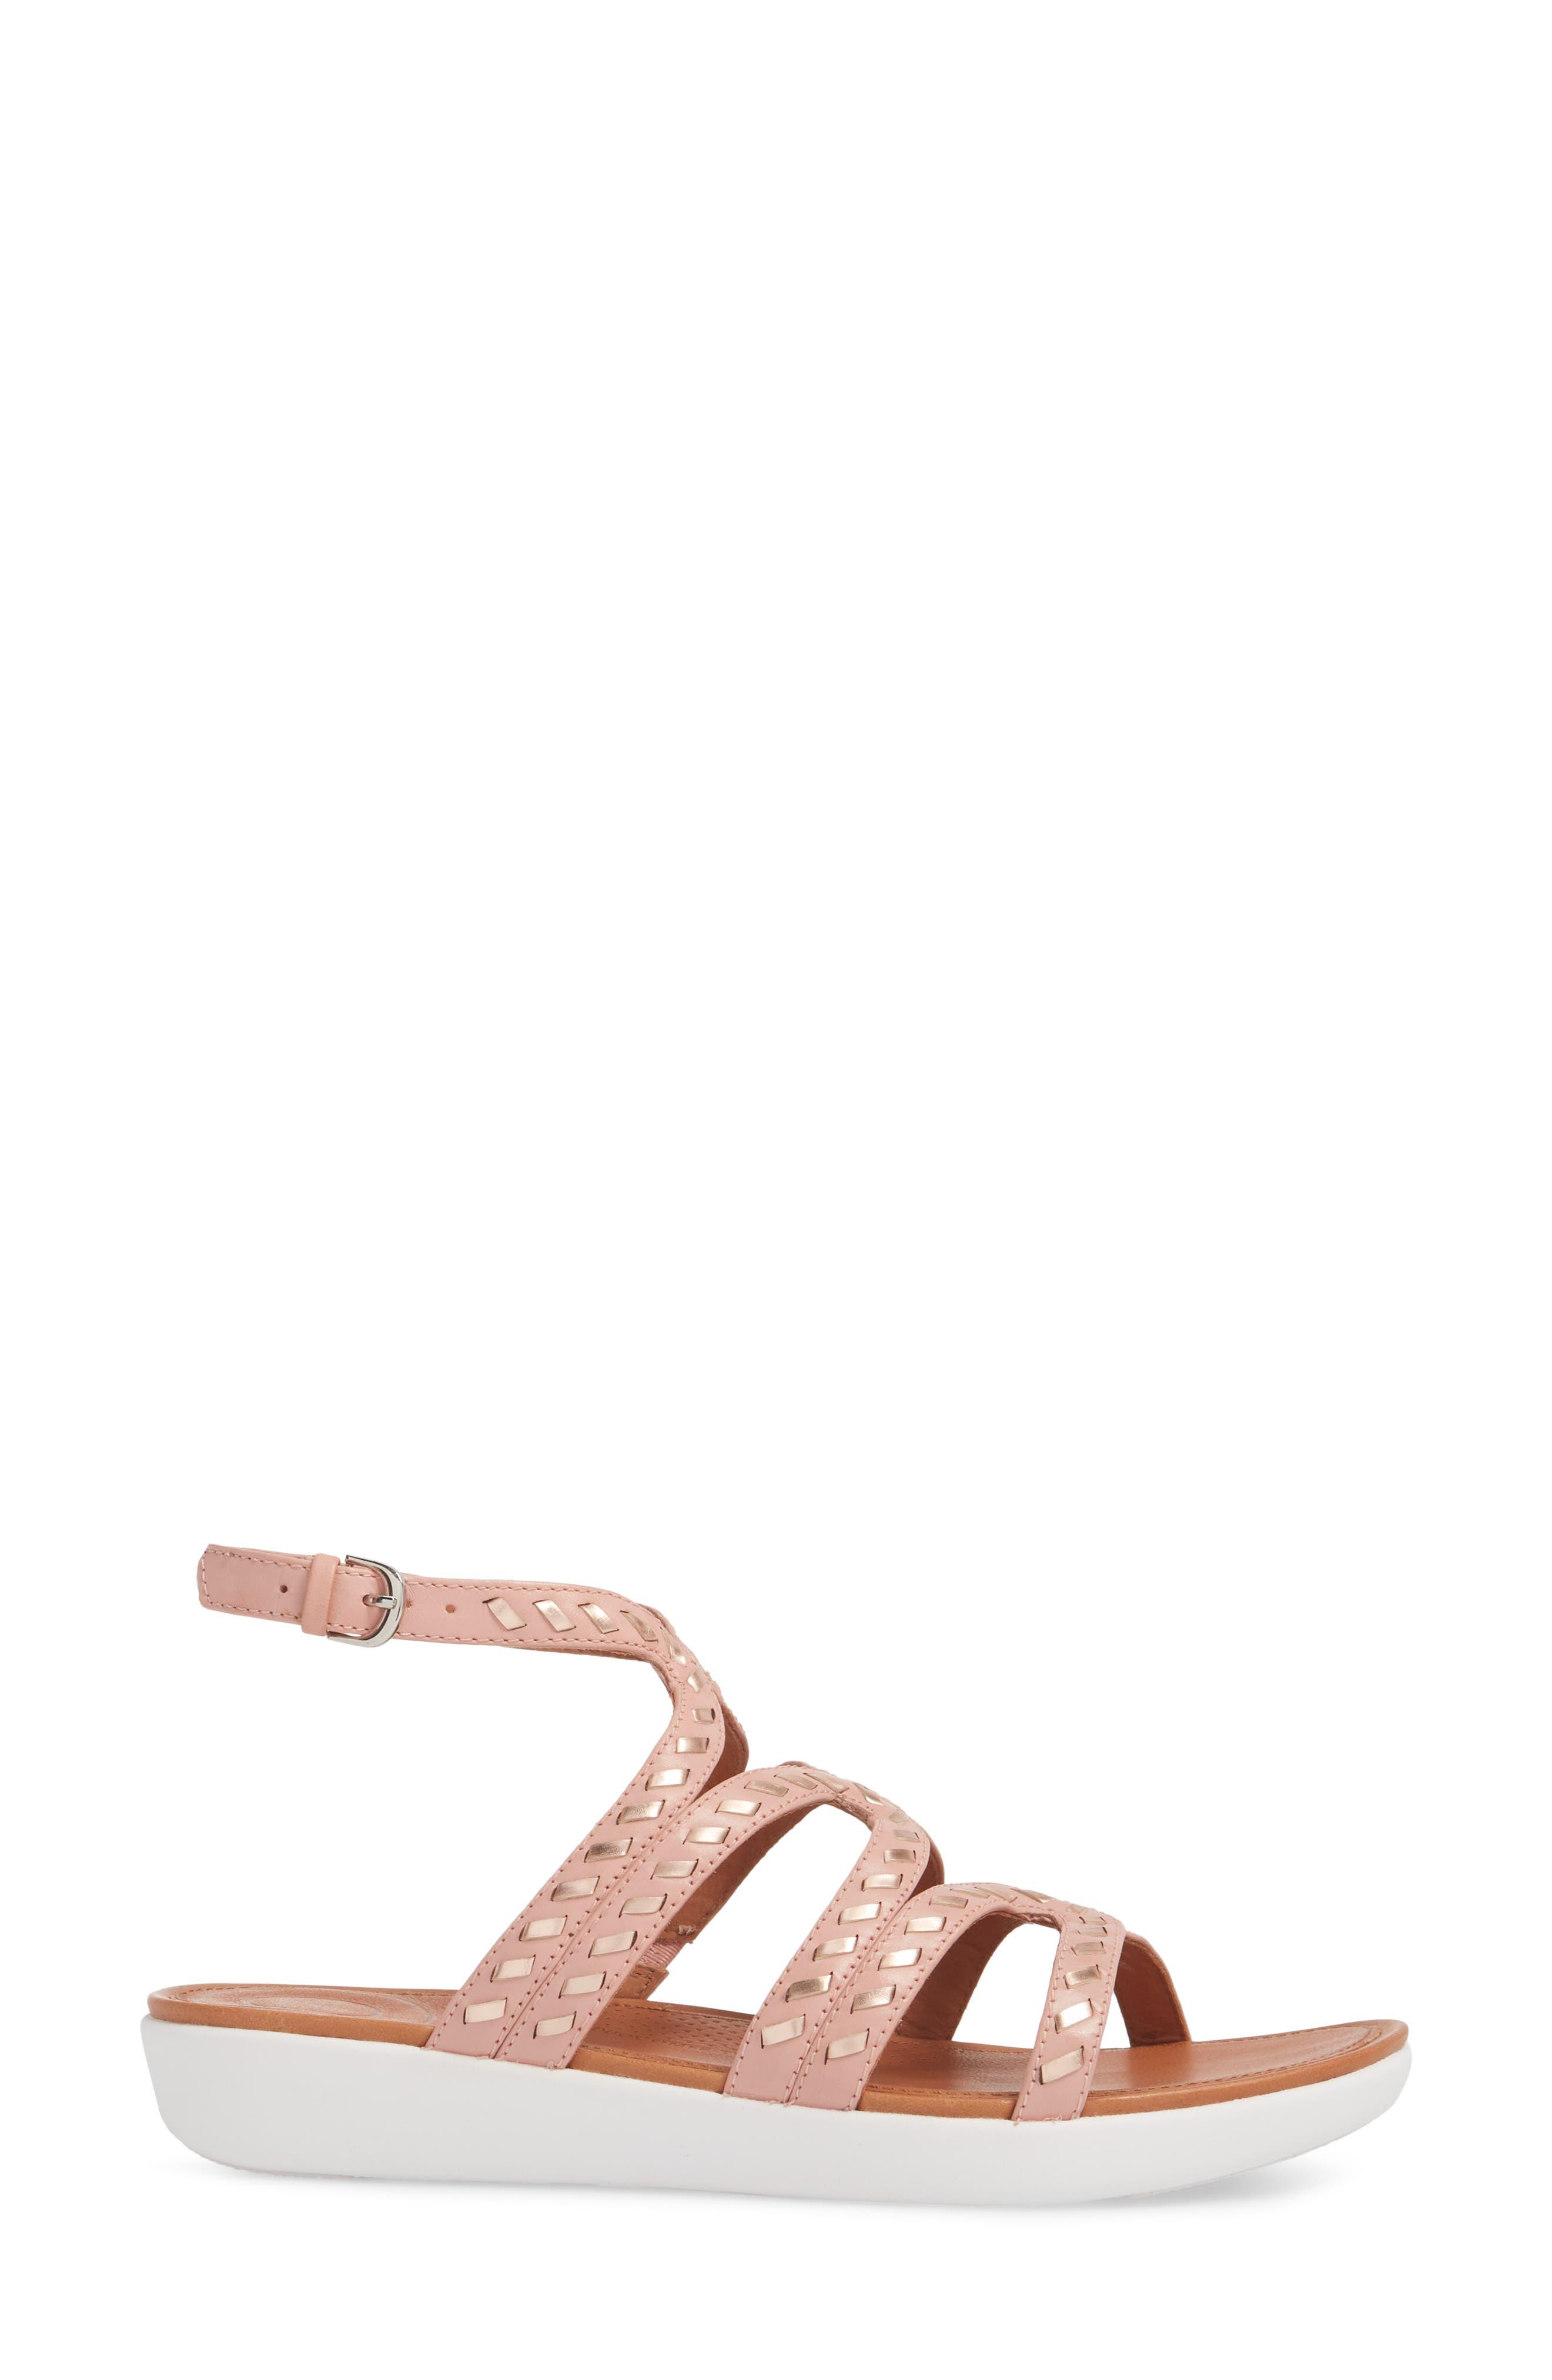 Strata Gladiator Sandal,                             Alternate thumbnail 3, color,                             DUSKY PINK LEATHER